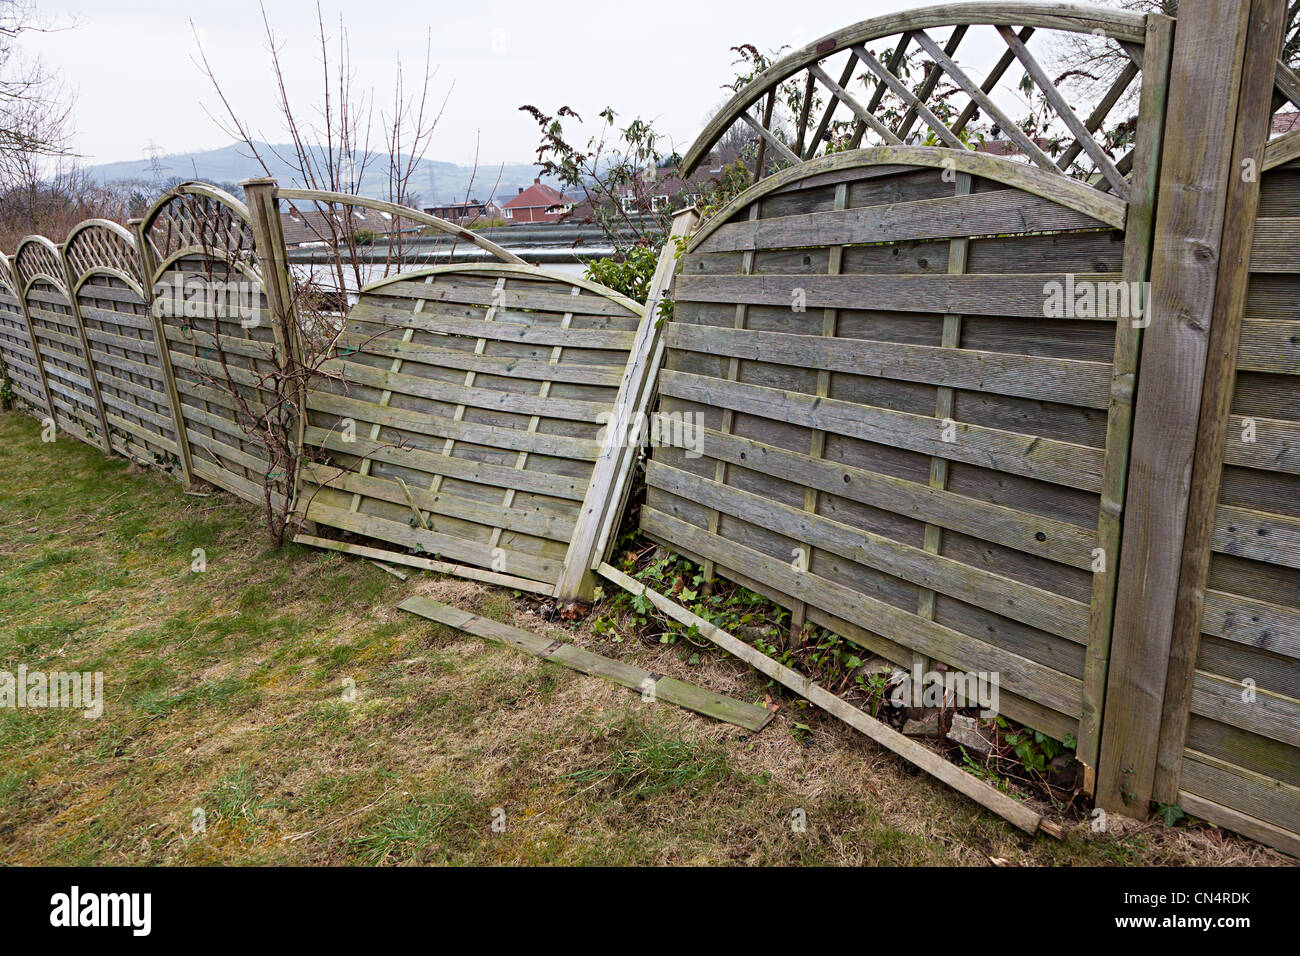 Gebrochene Zaun Im Garten Wegen Sturm Schaden Wales Uk Stockfoto